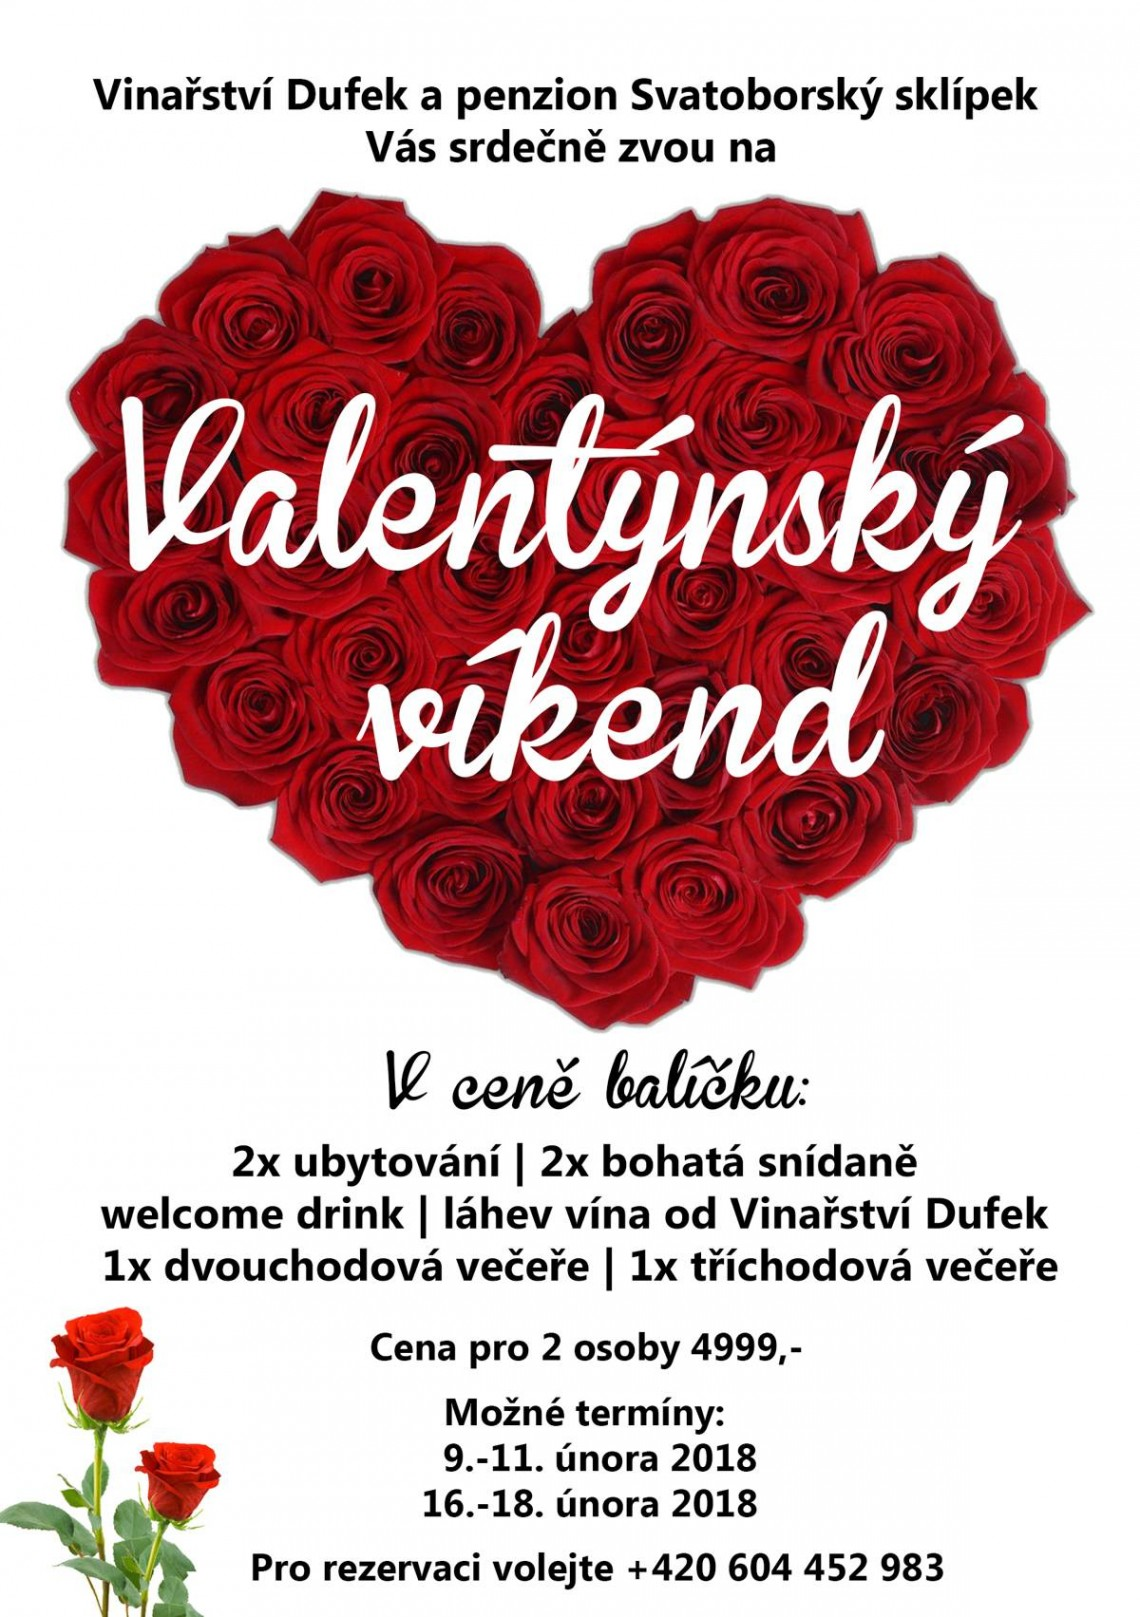 valentynsky-vikend-ve-vinarstvi.jpg